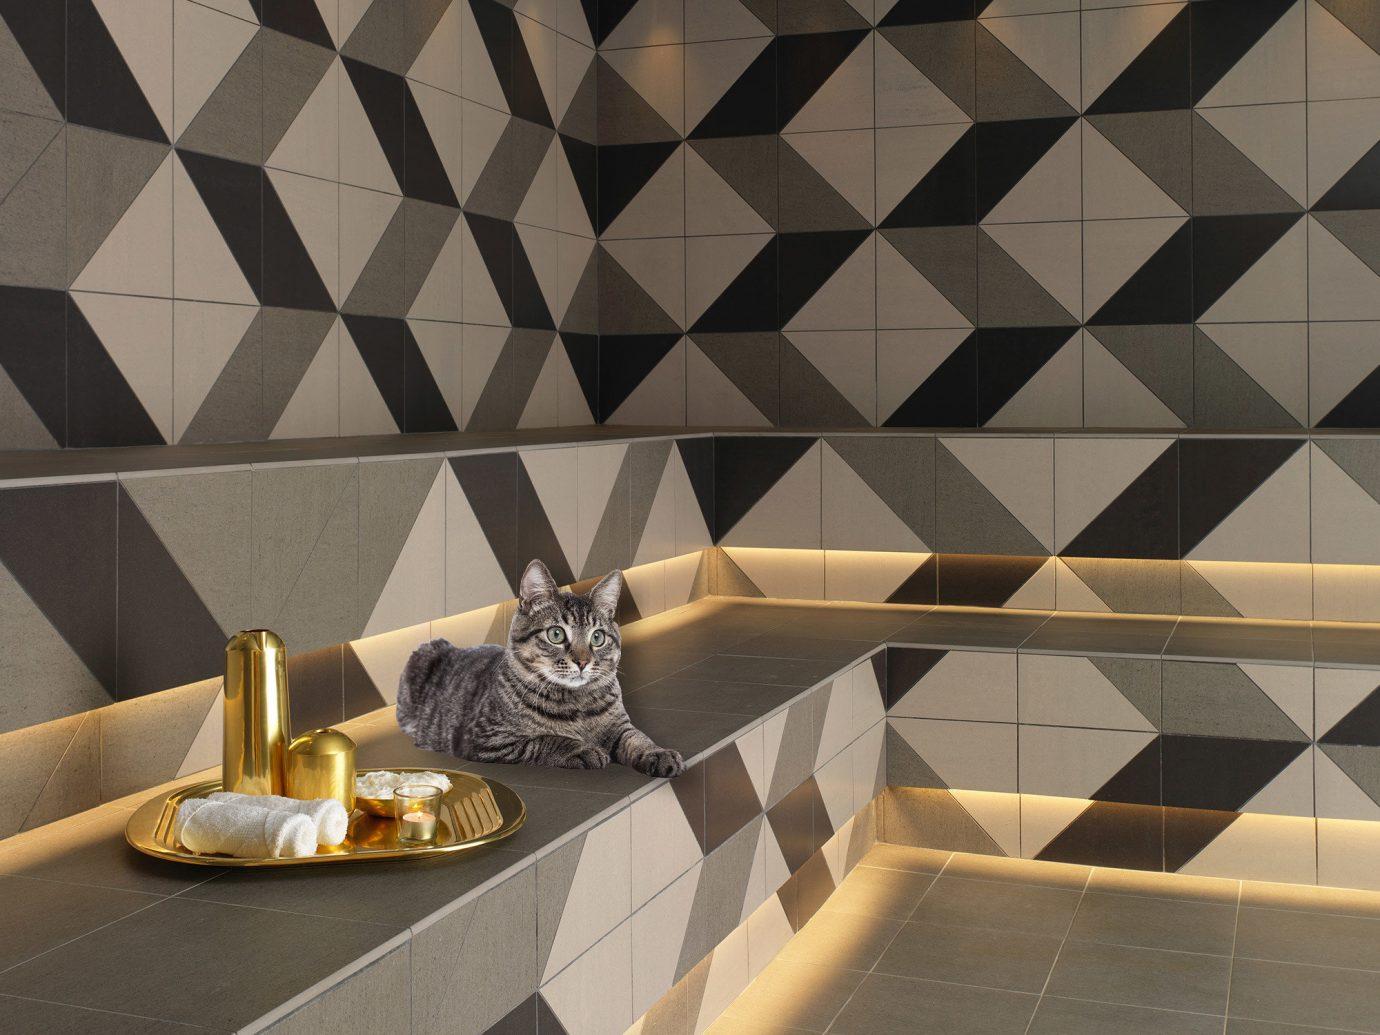 Hotels room tile floor wall flooring Design ceiling daylighting bathroom interior design tiled shape pattern symmetry wallpaper